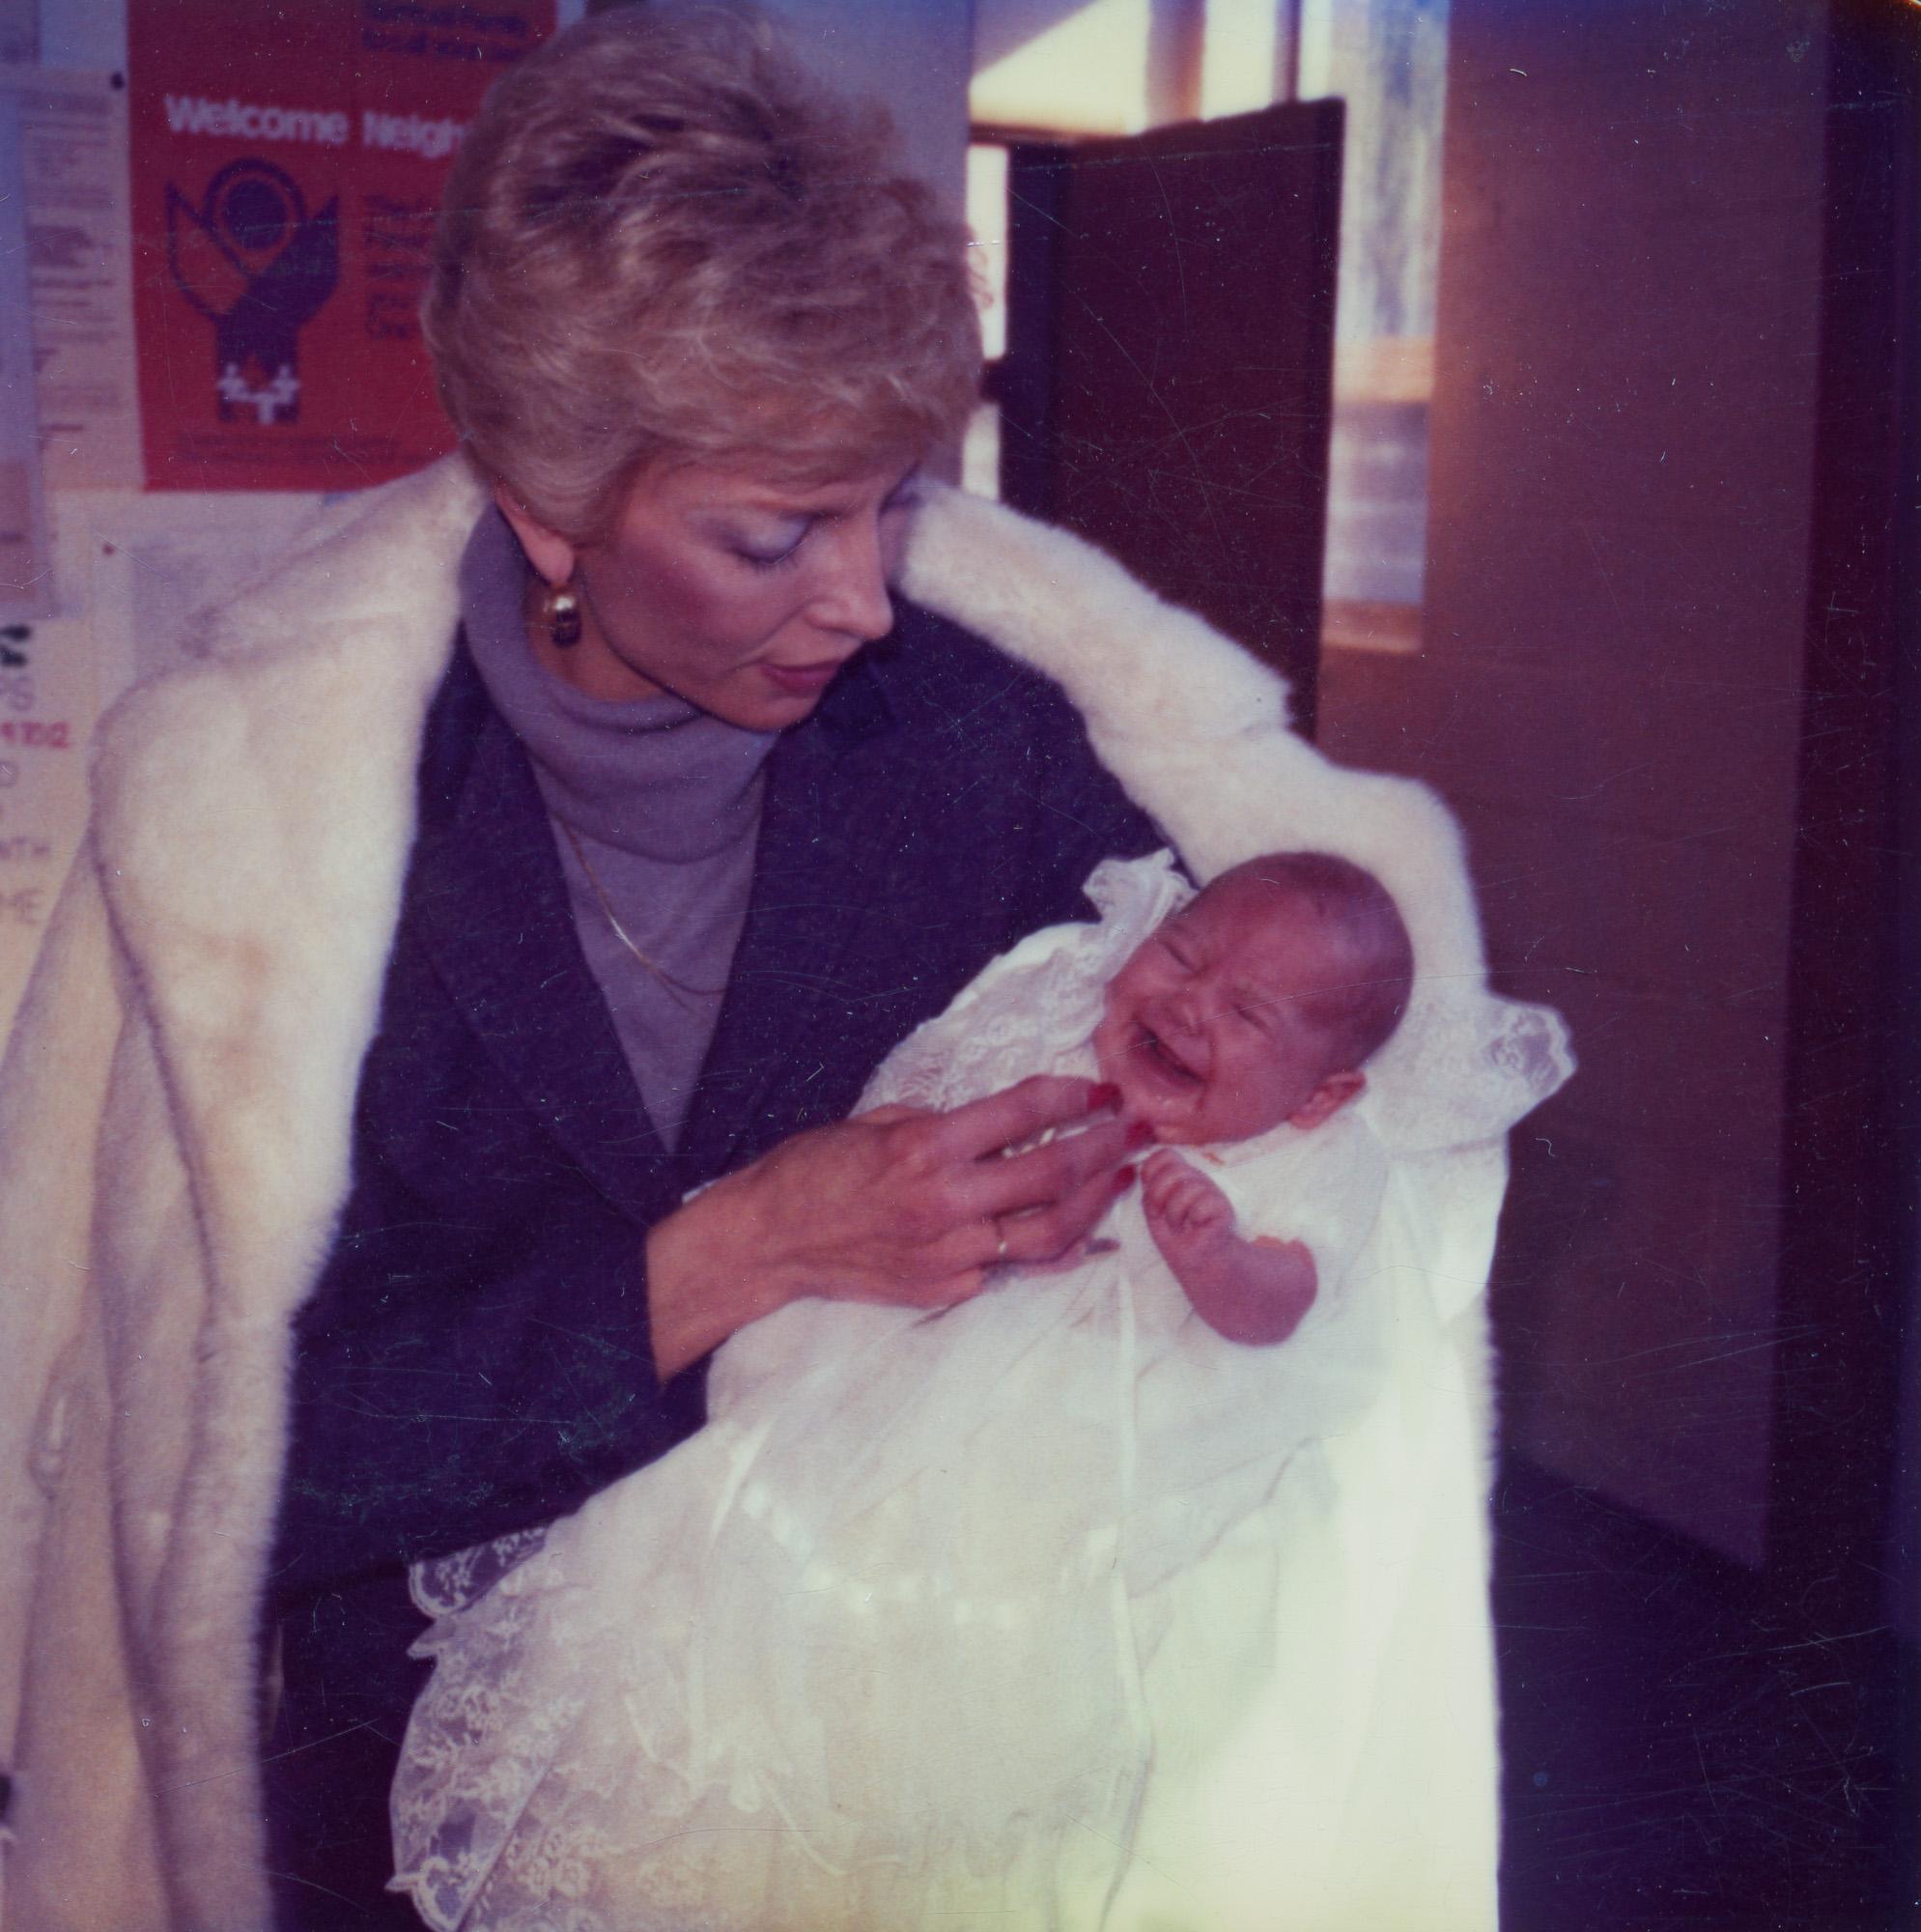 Joyce Yost holds one of her newborn granddaughters